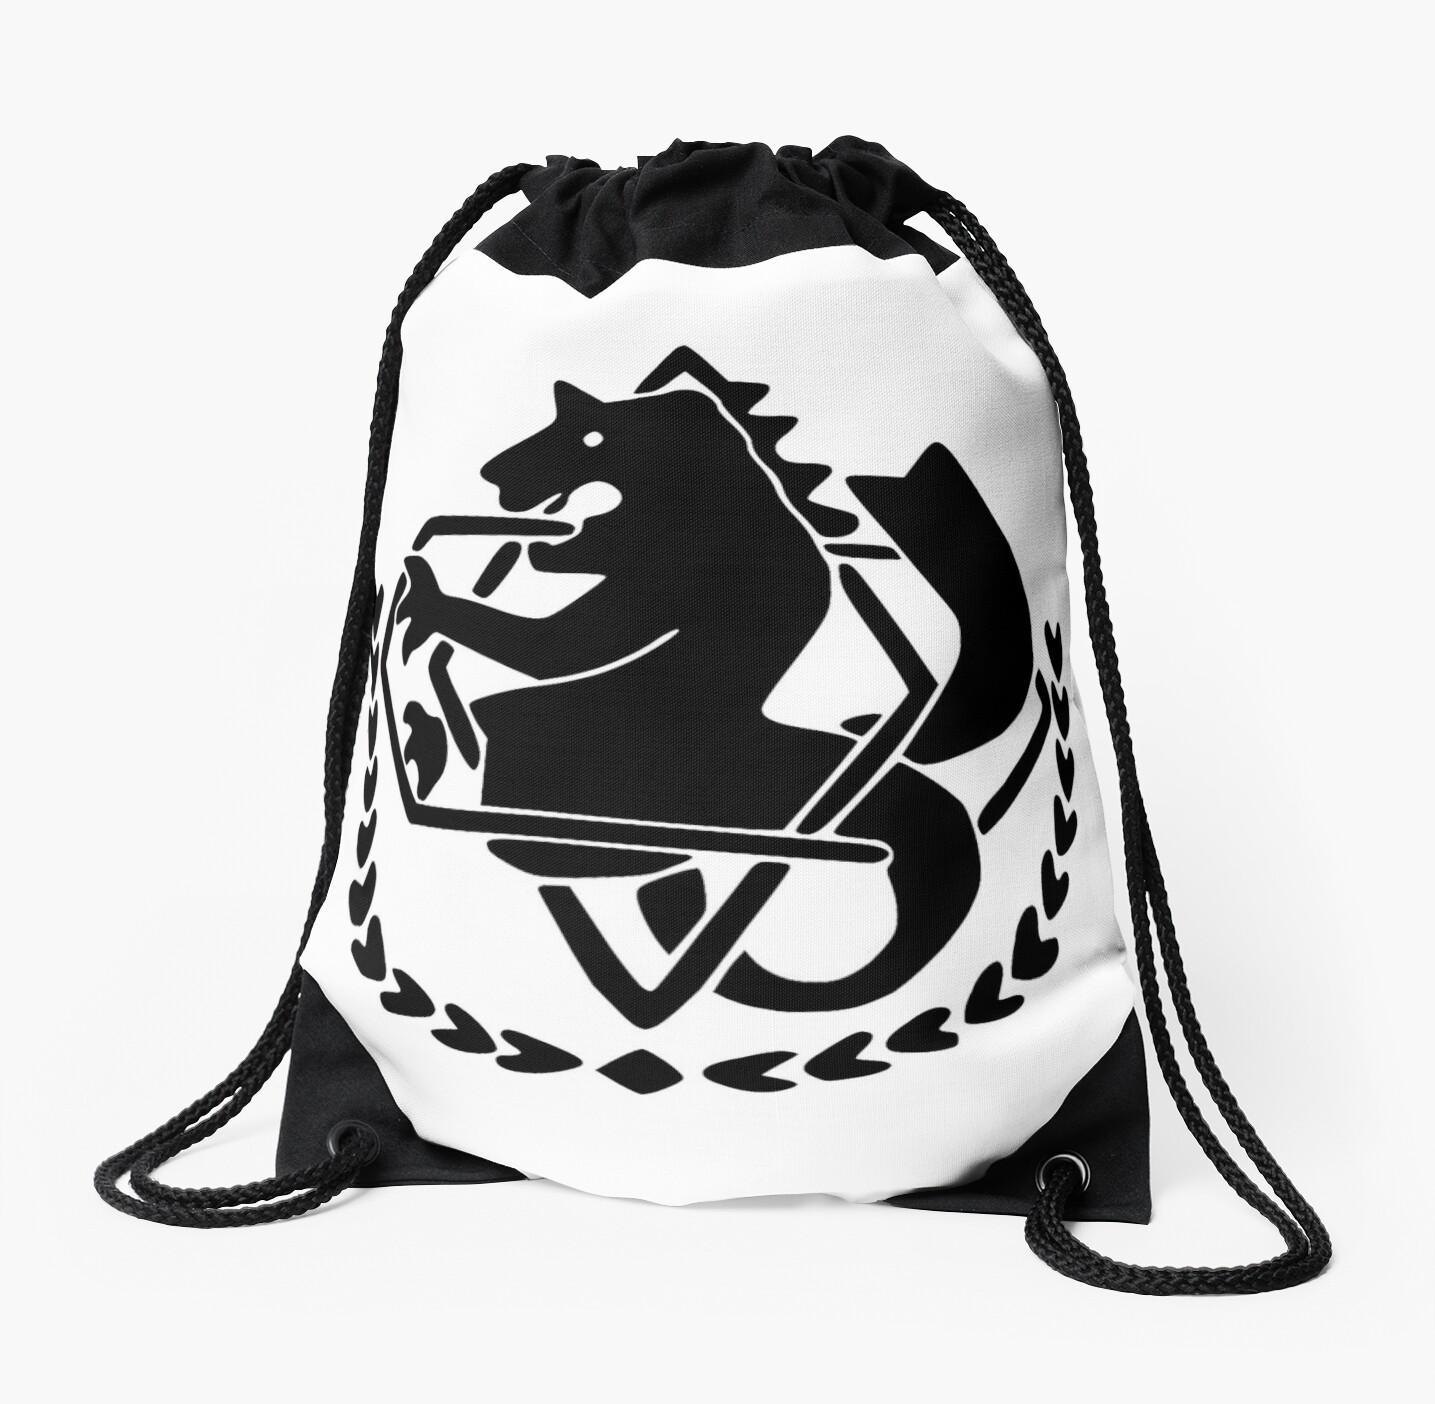 Fullmetal Alchemist Alchemist Symbol Drawstring Bags By